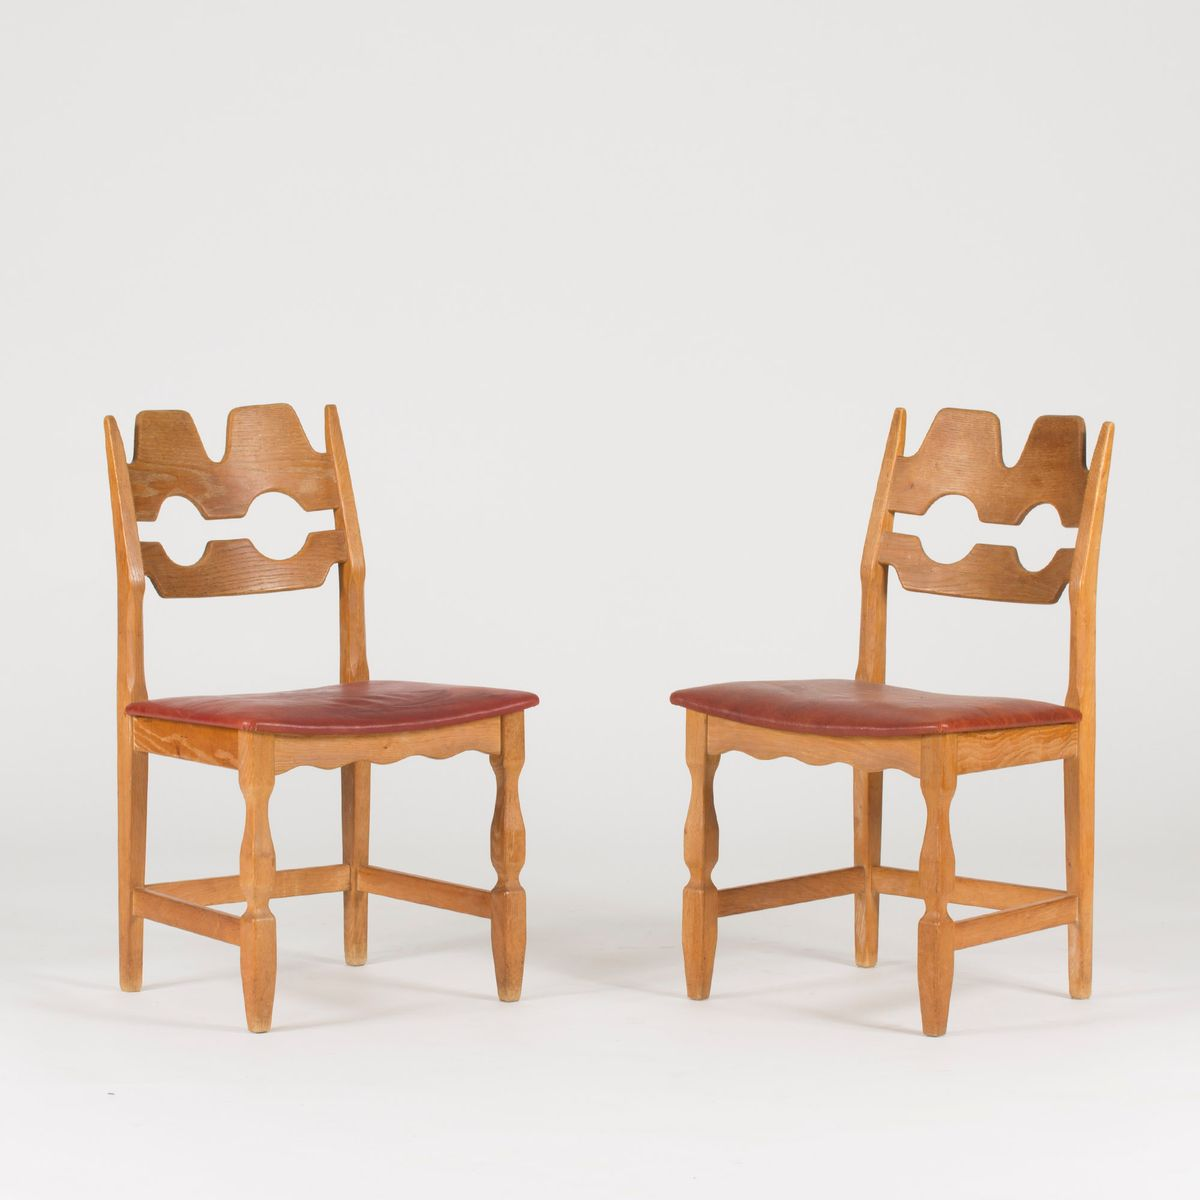 eichenholz esszimmerst hle von henning kj rnulf 1960er. Black Bedroom Furniture Sets. Home Design Ideas